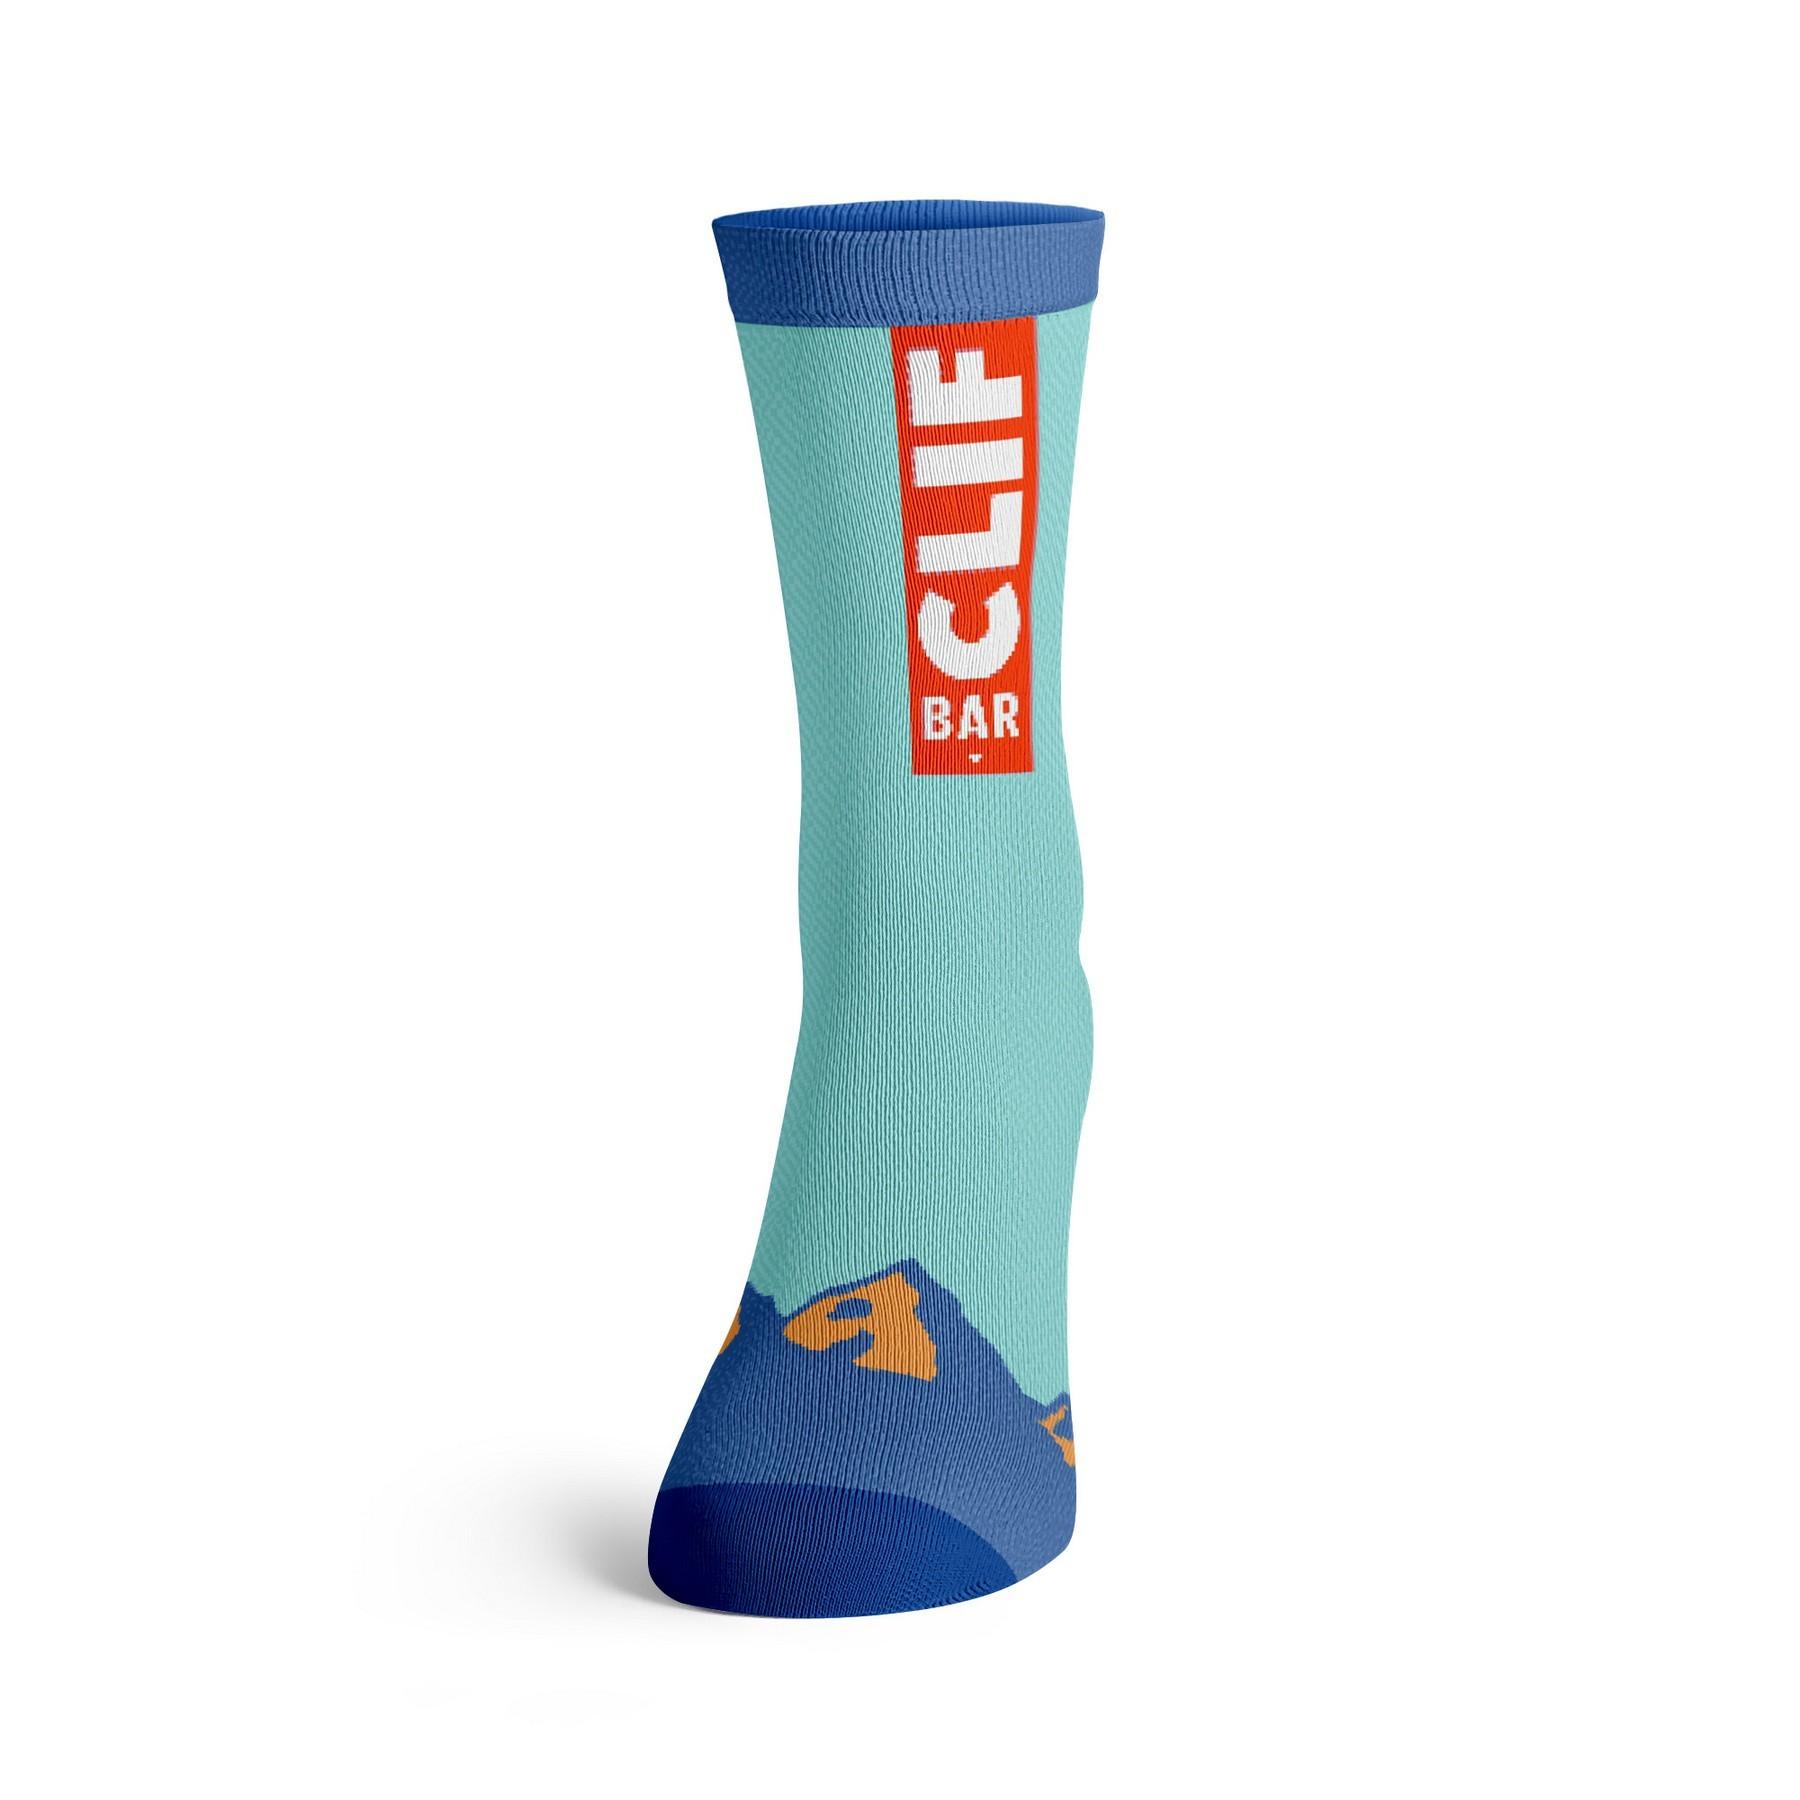 Antimicrobial Jacquard Socks